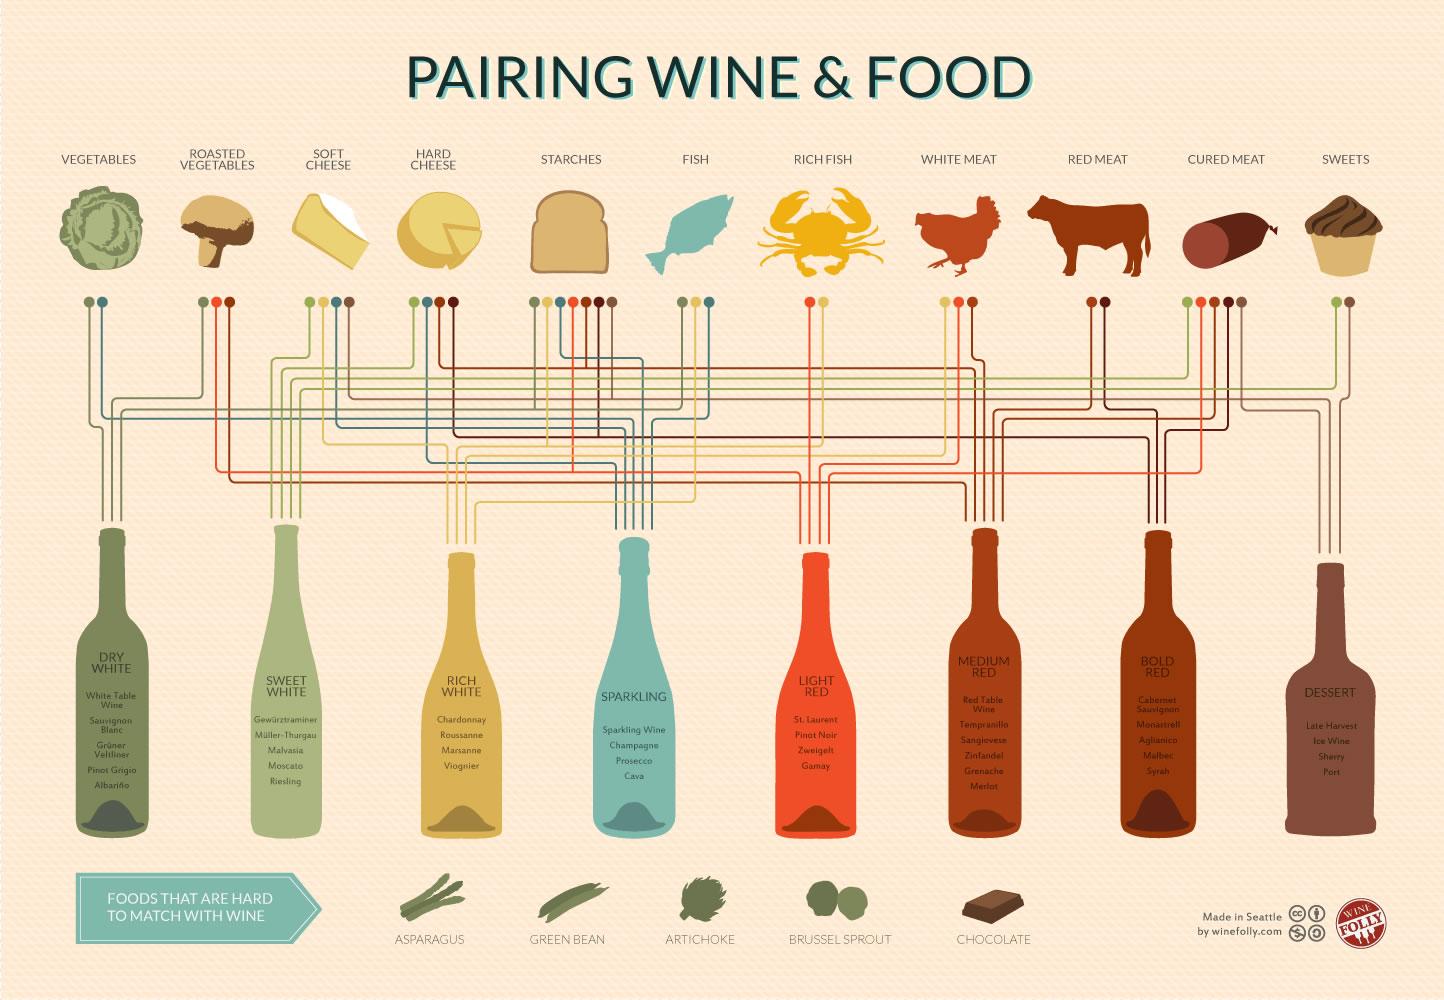 wine-pairing-chart_510ff8a6ca58b